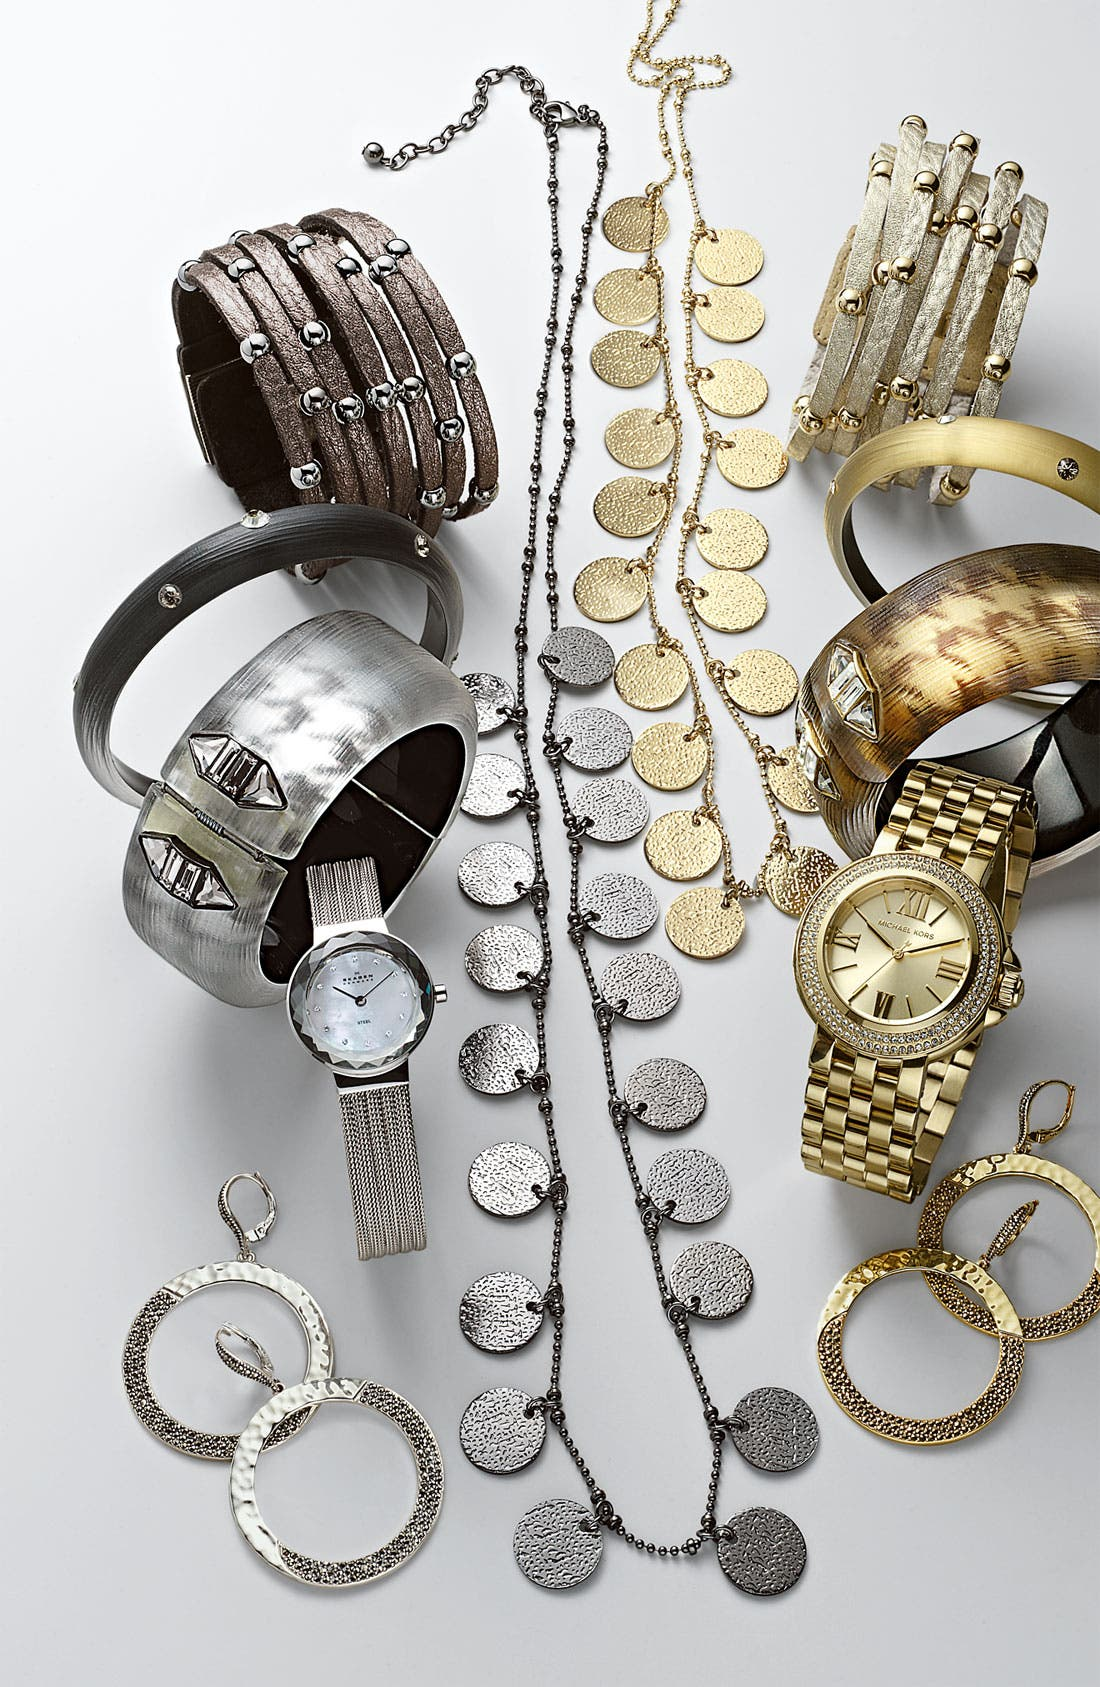 MICHAEL MICHAEL KORS, Michael Kors 'Lucy' Crystal Bezel Bracelet Watch, Alternate thumbnail 2, color, 040